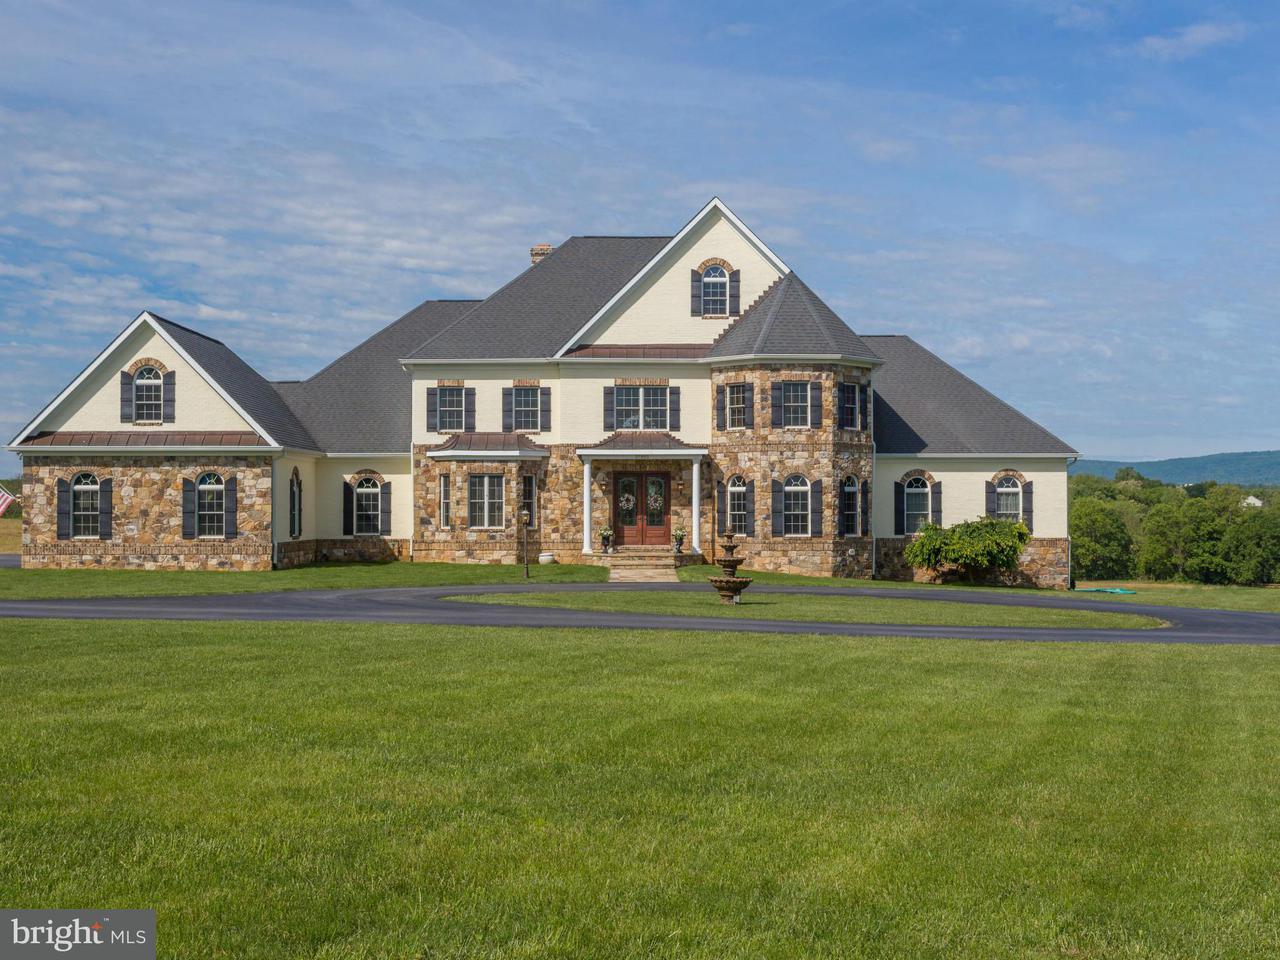 獨棟家庭住宅 為 出售 在 37861 BAKER MILL Road 37861 BAKER MILL Road Purcellville, 弗吉尼亞州 20132 美國